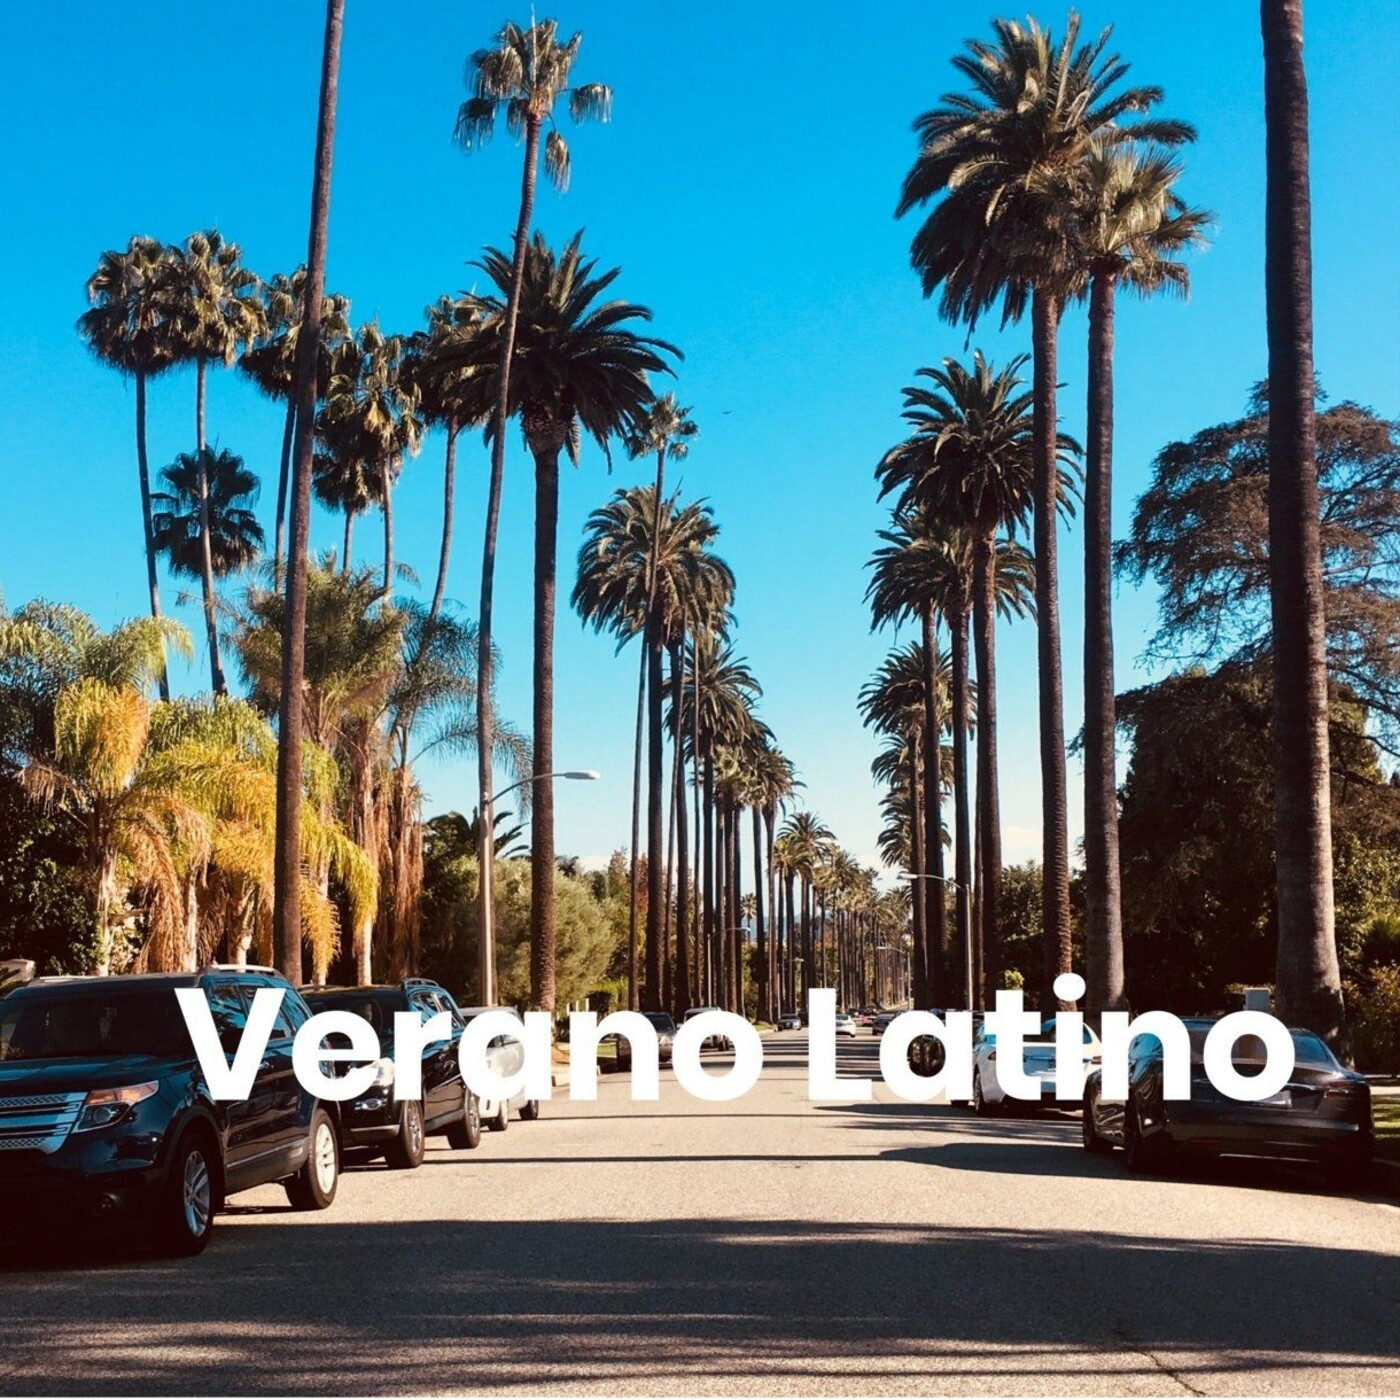 verano-latino-2020